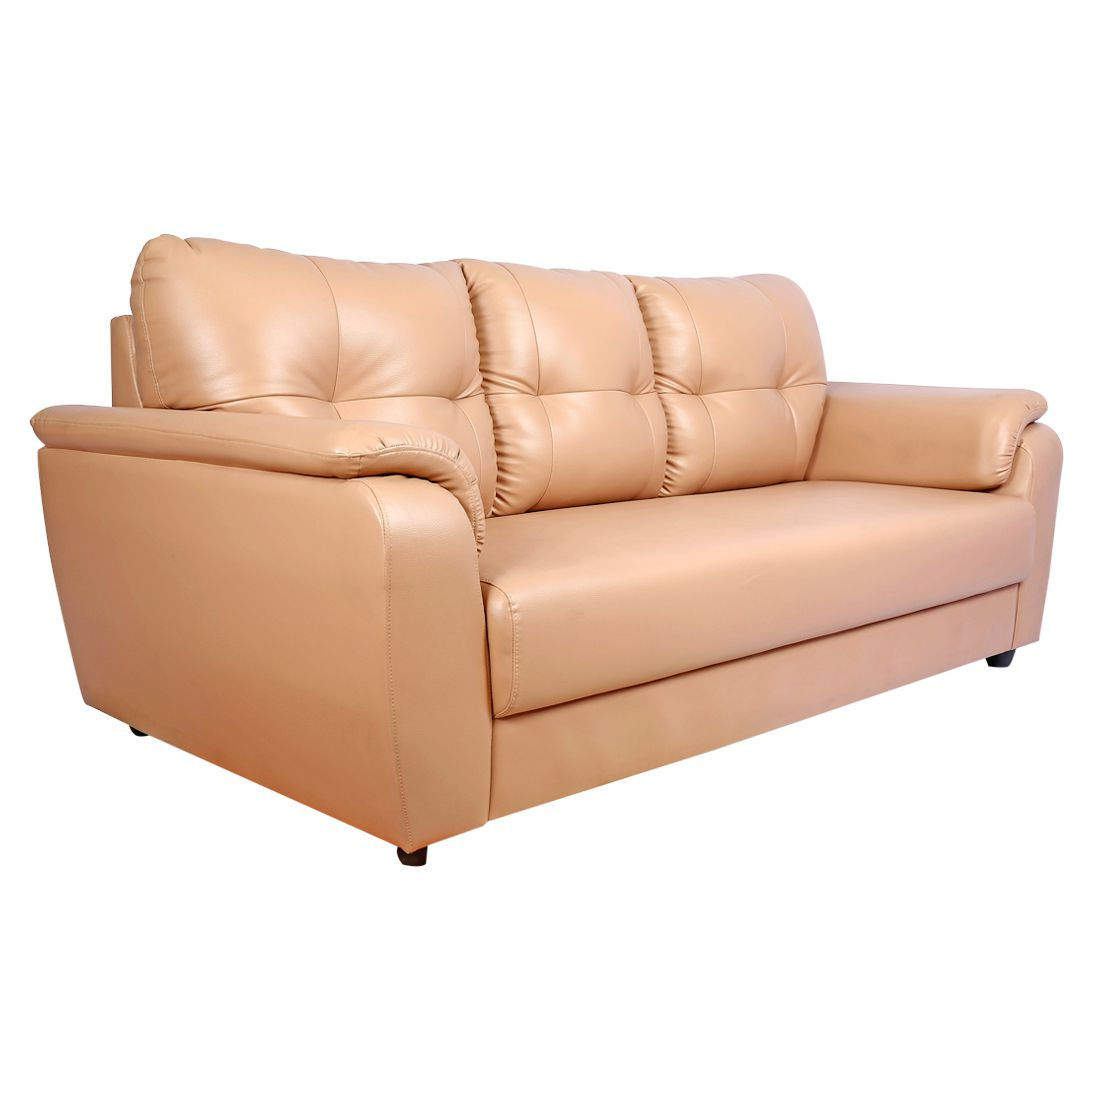 Woodmark Sofa Teachfamilies Org